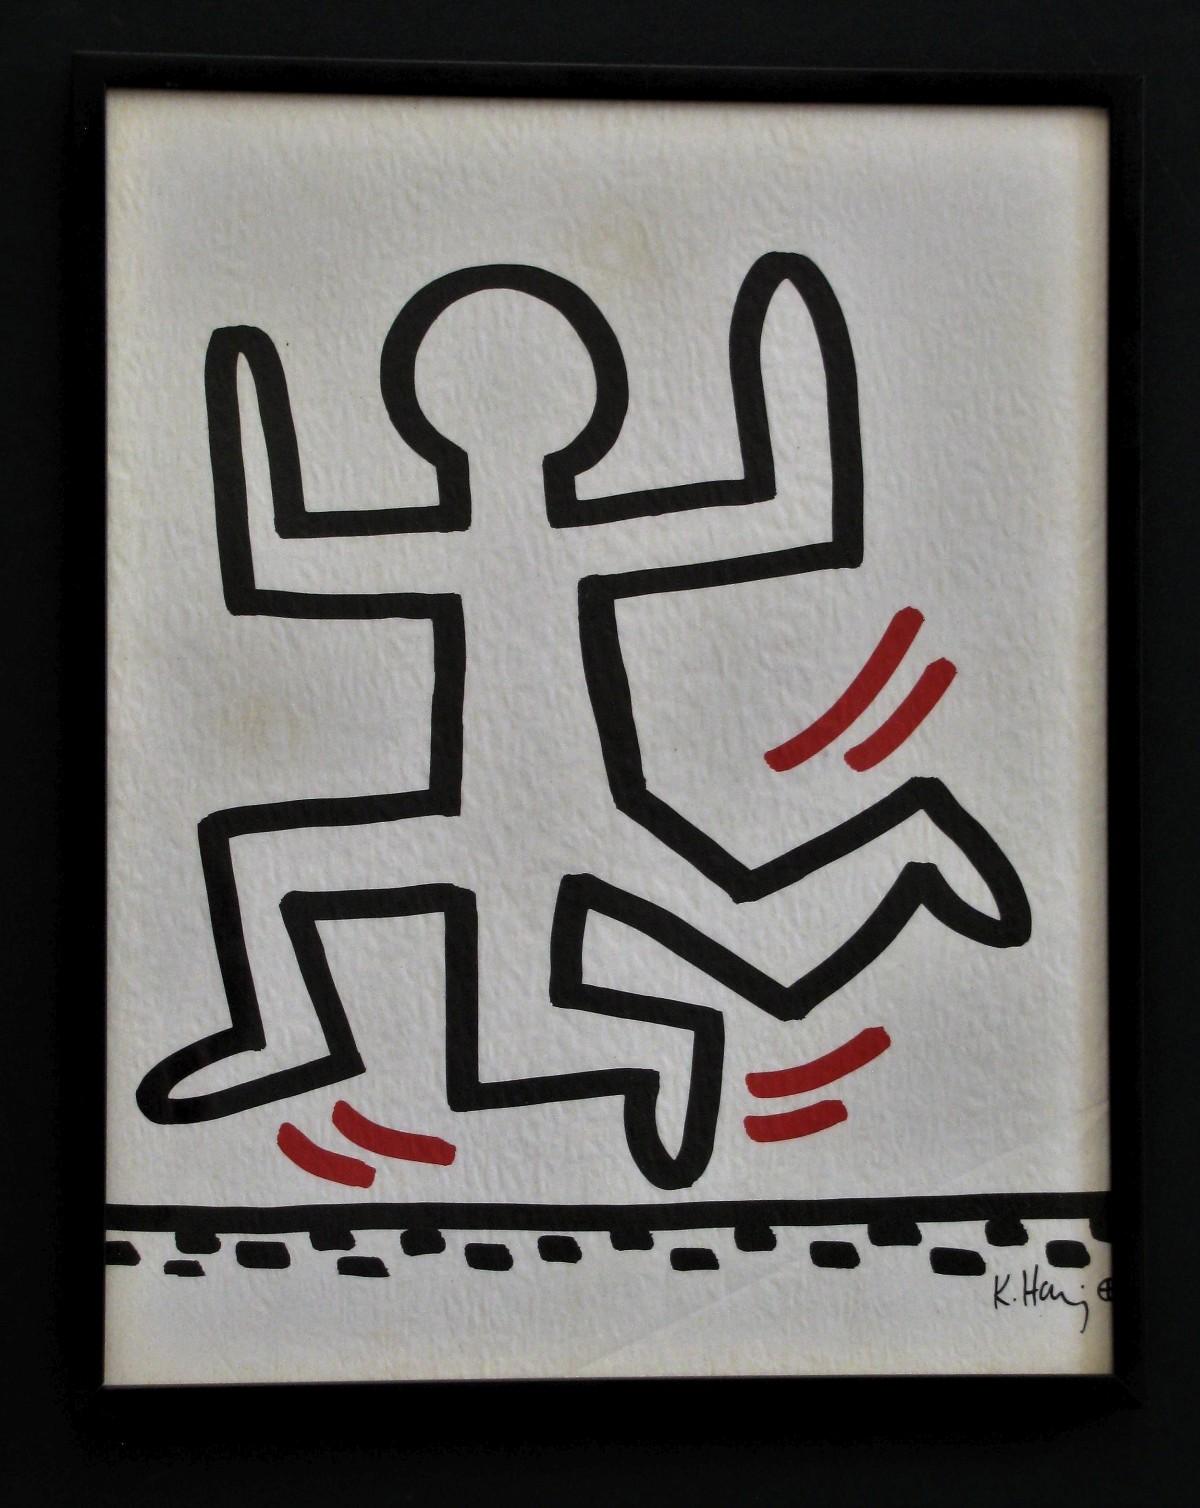 Keith Haring - BLATT aus der BAYER SUITE 1982 . 3 LEGED RUNNER kopen? Bied vanaf 500!